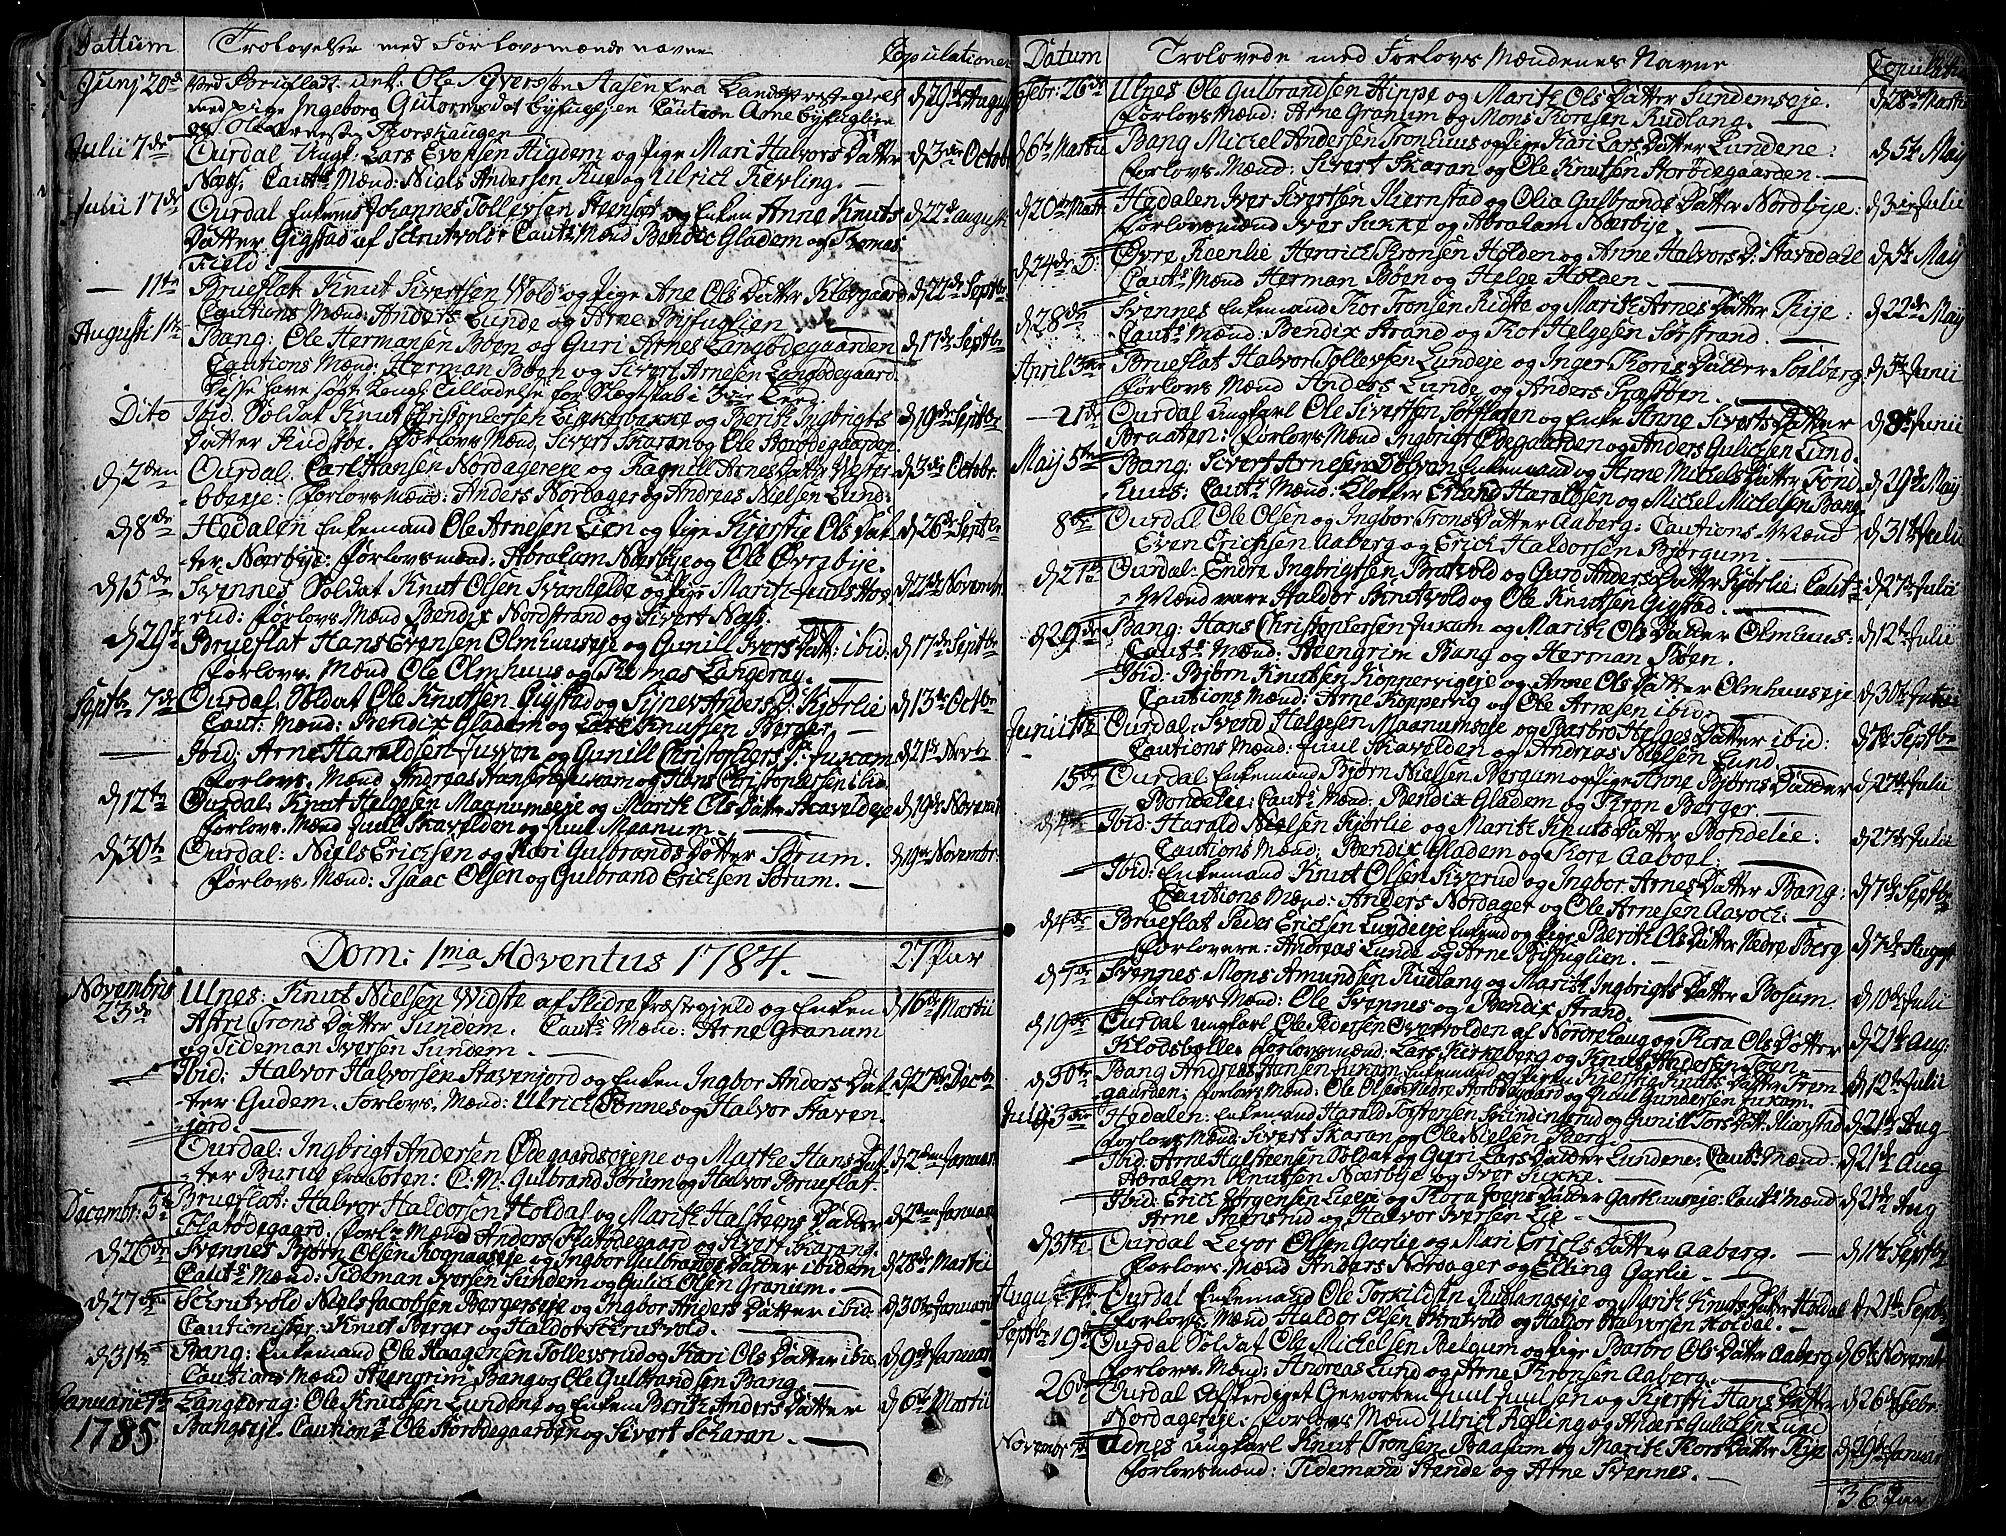 SAH, Aurdal prestekontor, Ministerialbok nr. 6, 1781-1804, s. 132